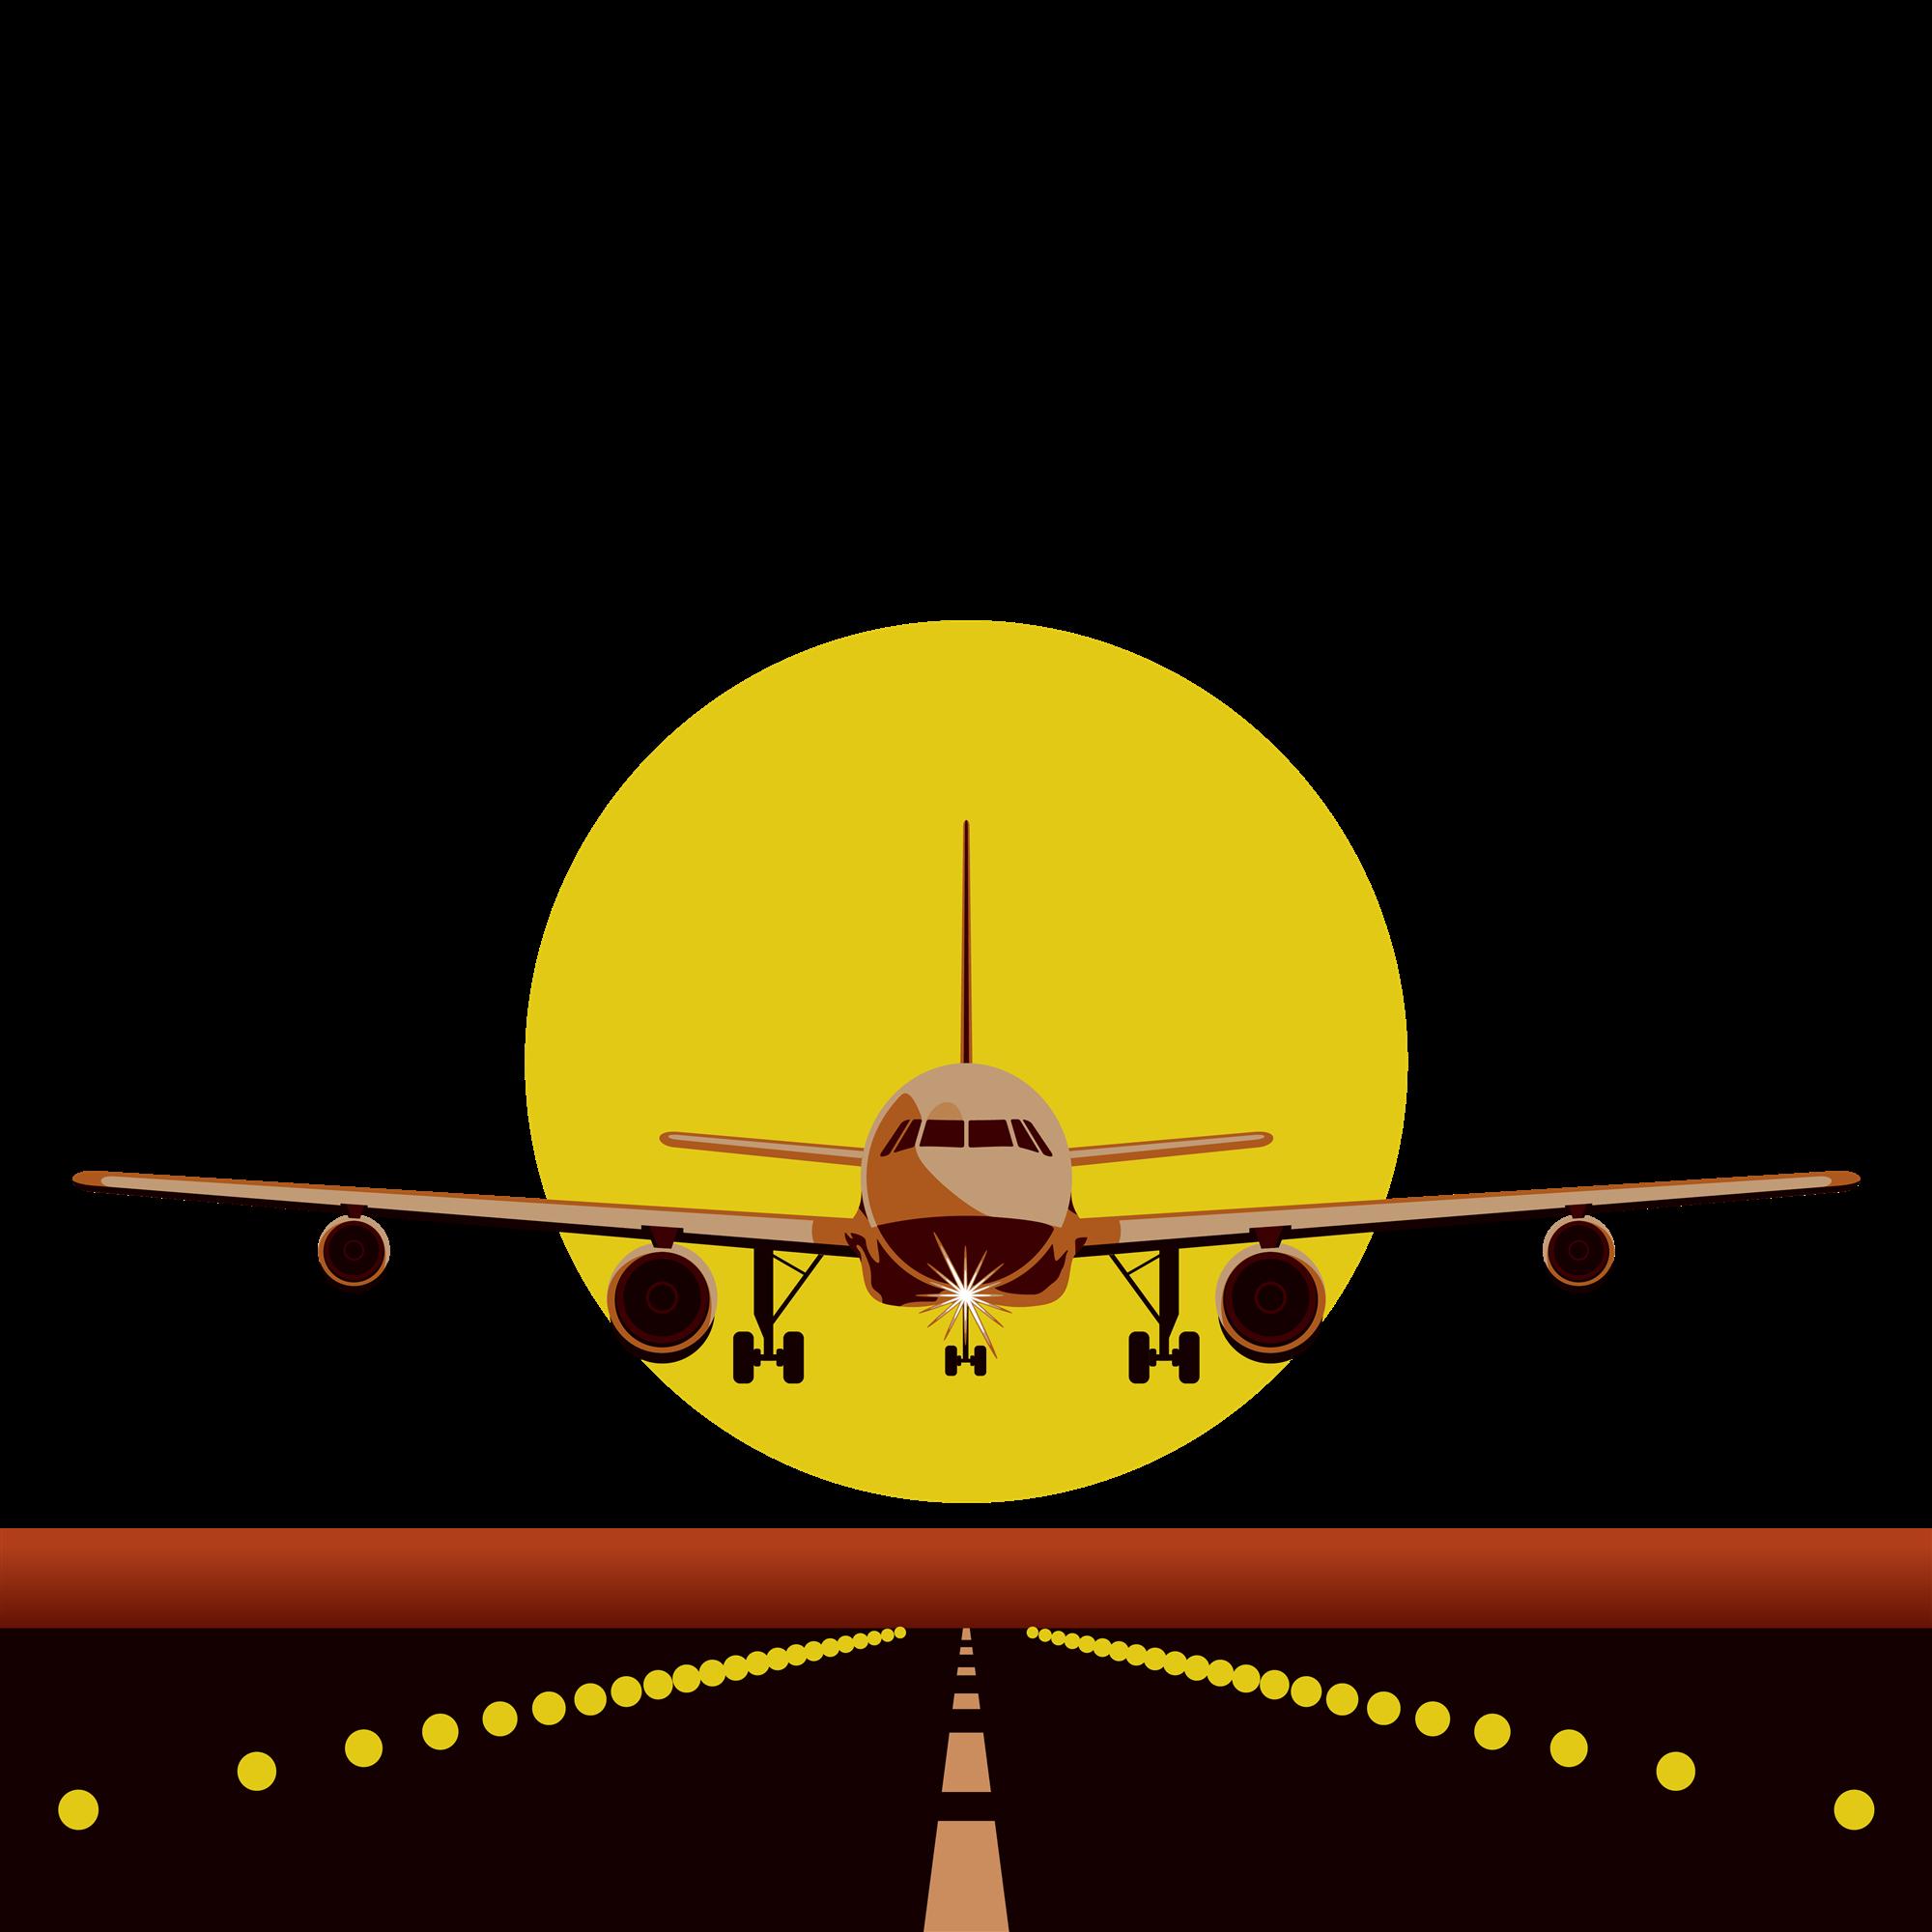 面膜航空貨運